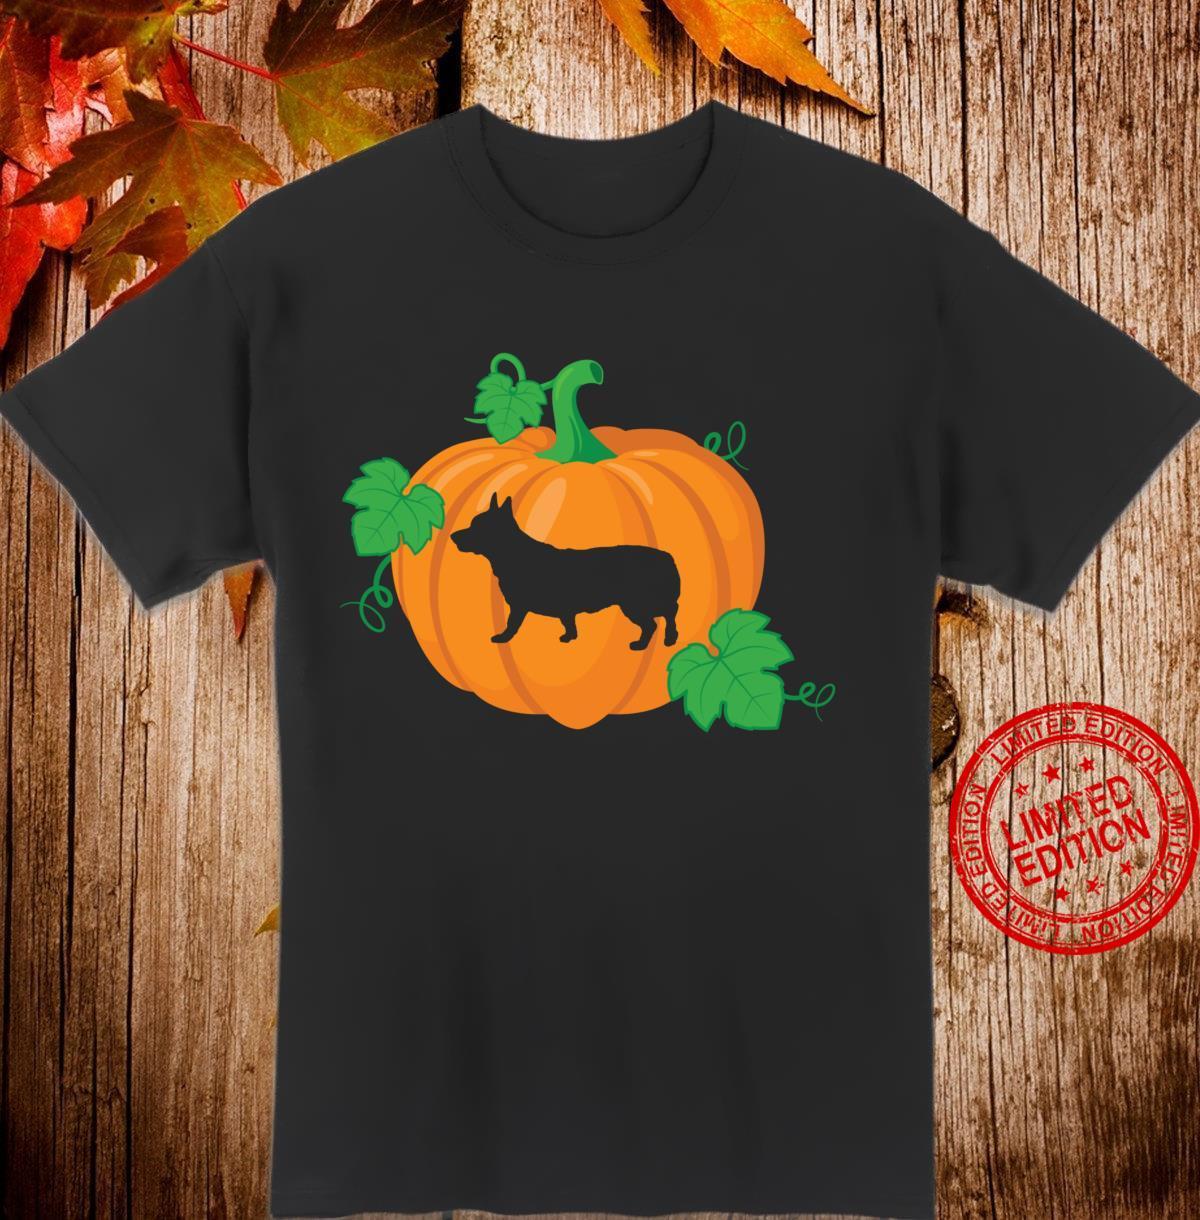 Halloween Corgi Dog Silhouette in Orange Pumpkin Shirt